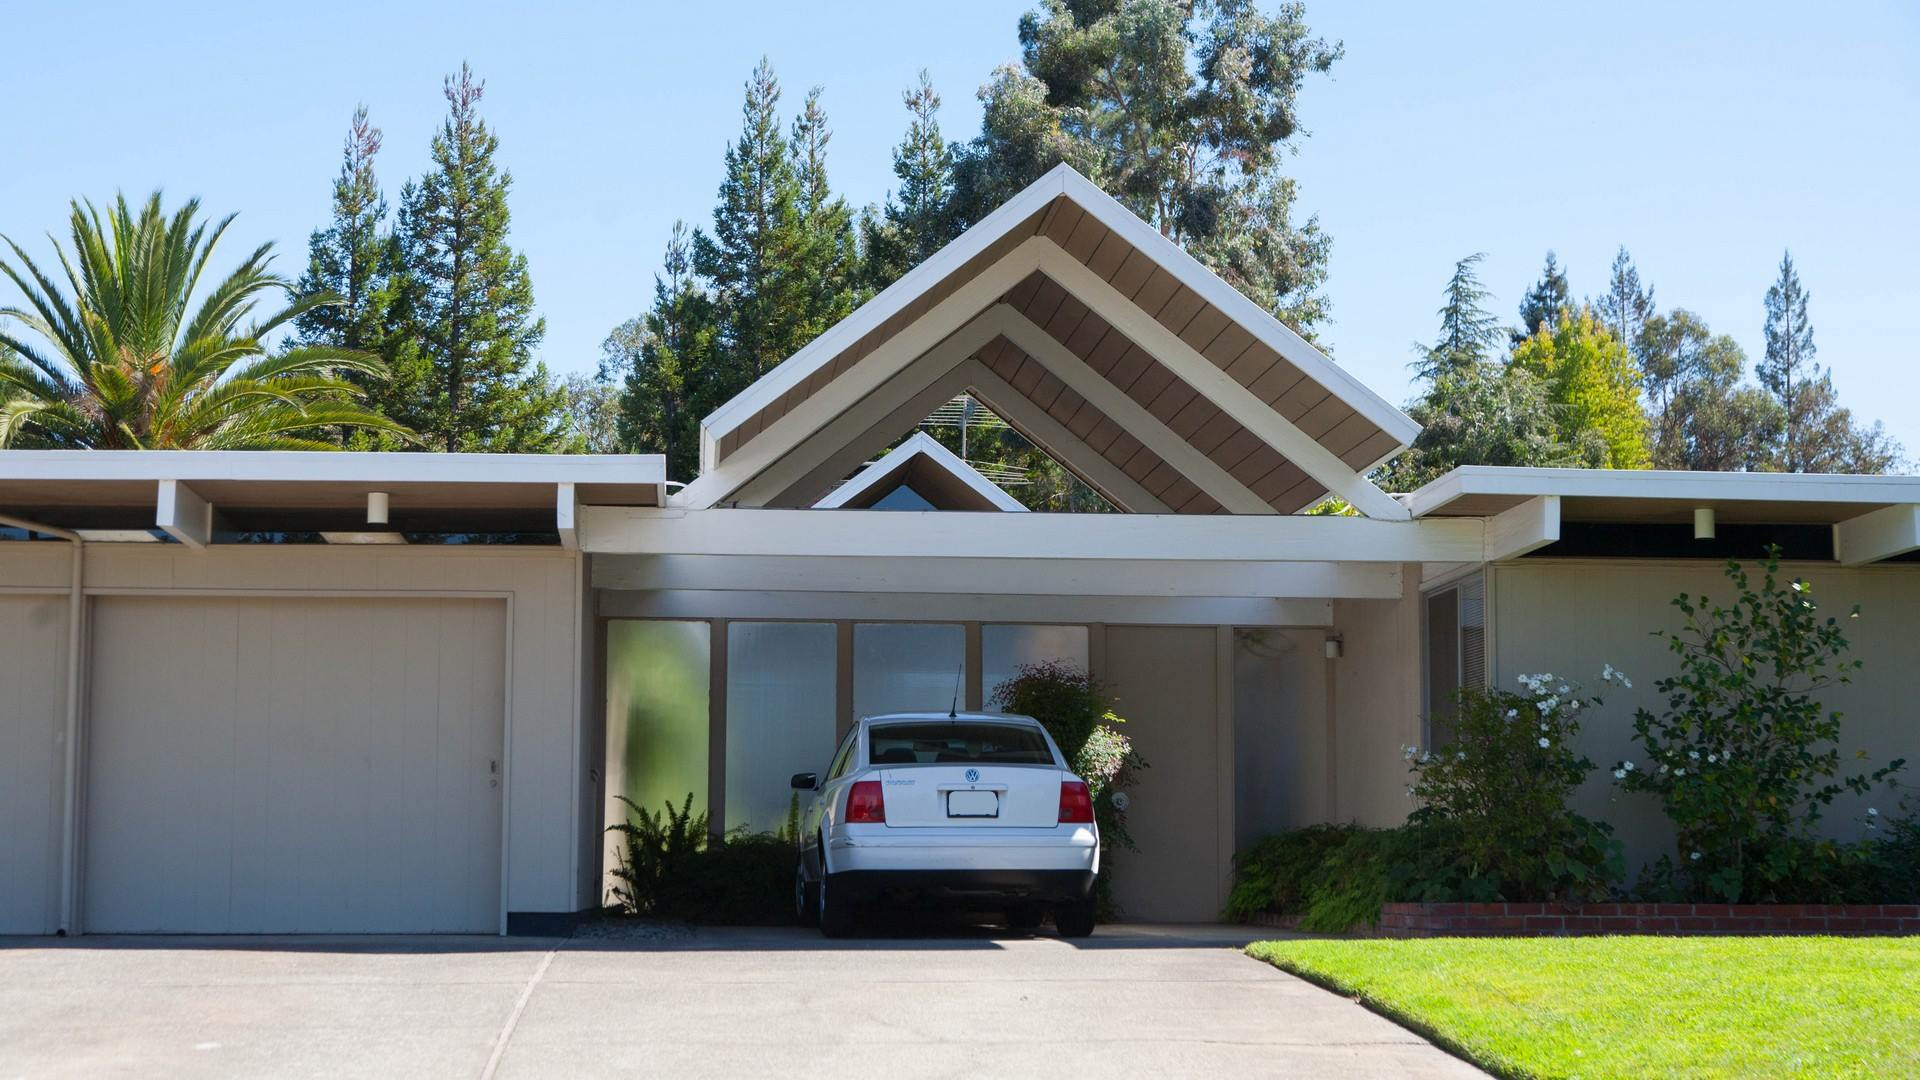 Saratoga eichler homes south bay eichlers for Eichler homes for sale bay area